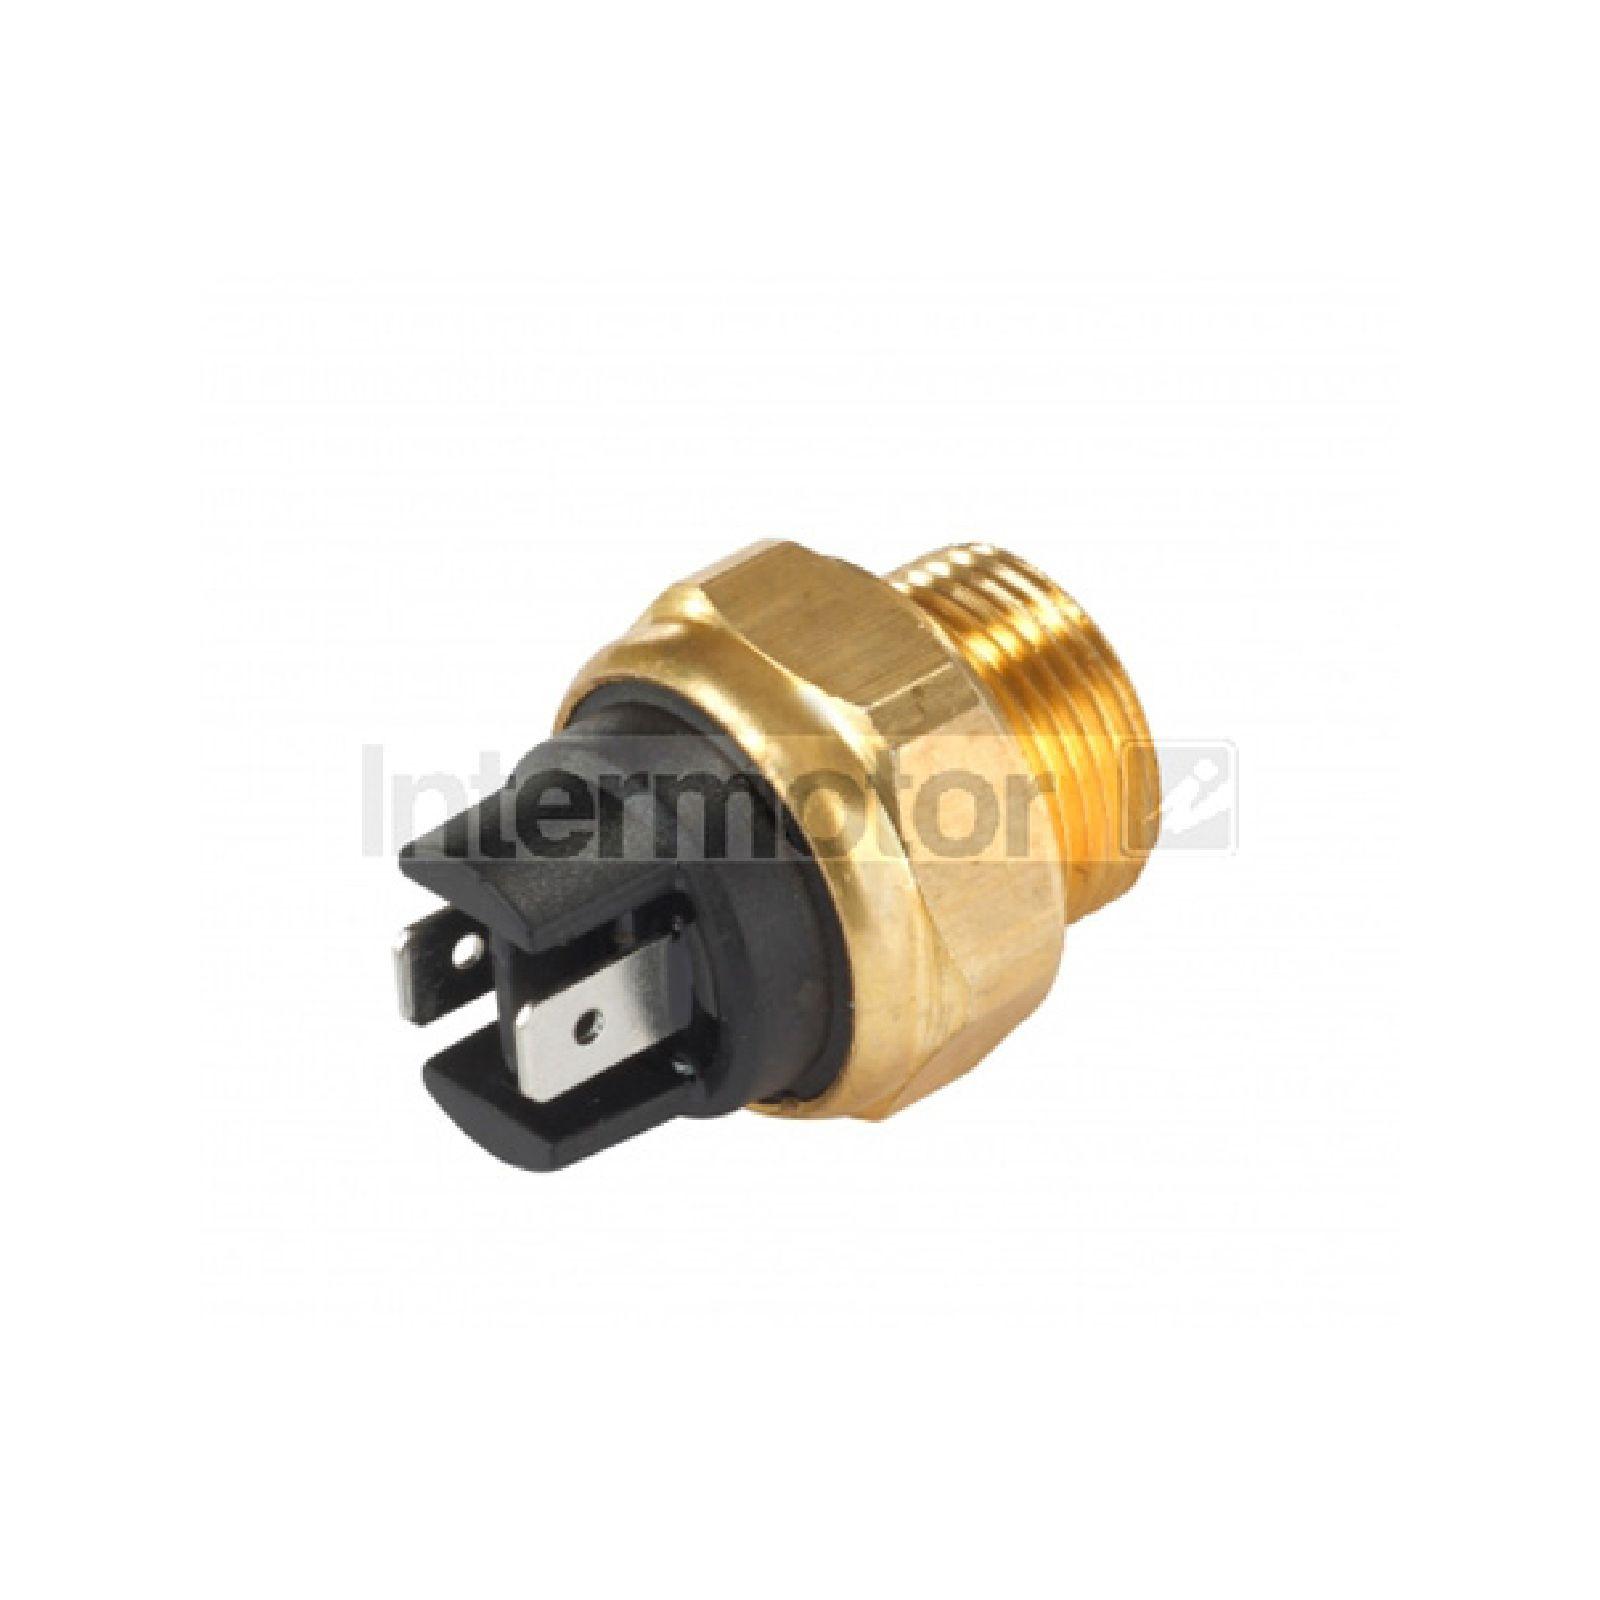 Cooling Fan Temperature Switch : °c range intermotor radiator fan temperature switch